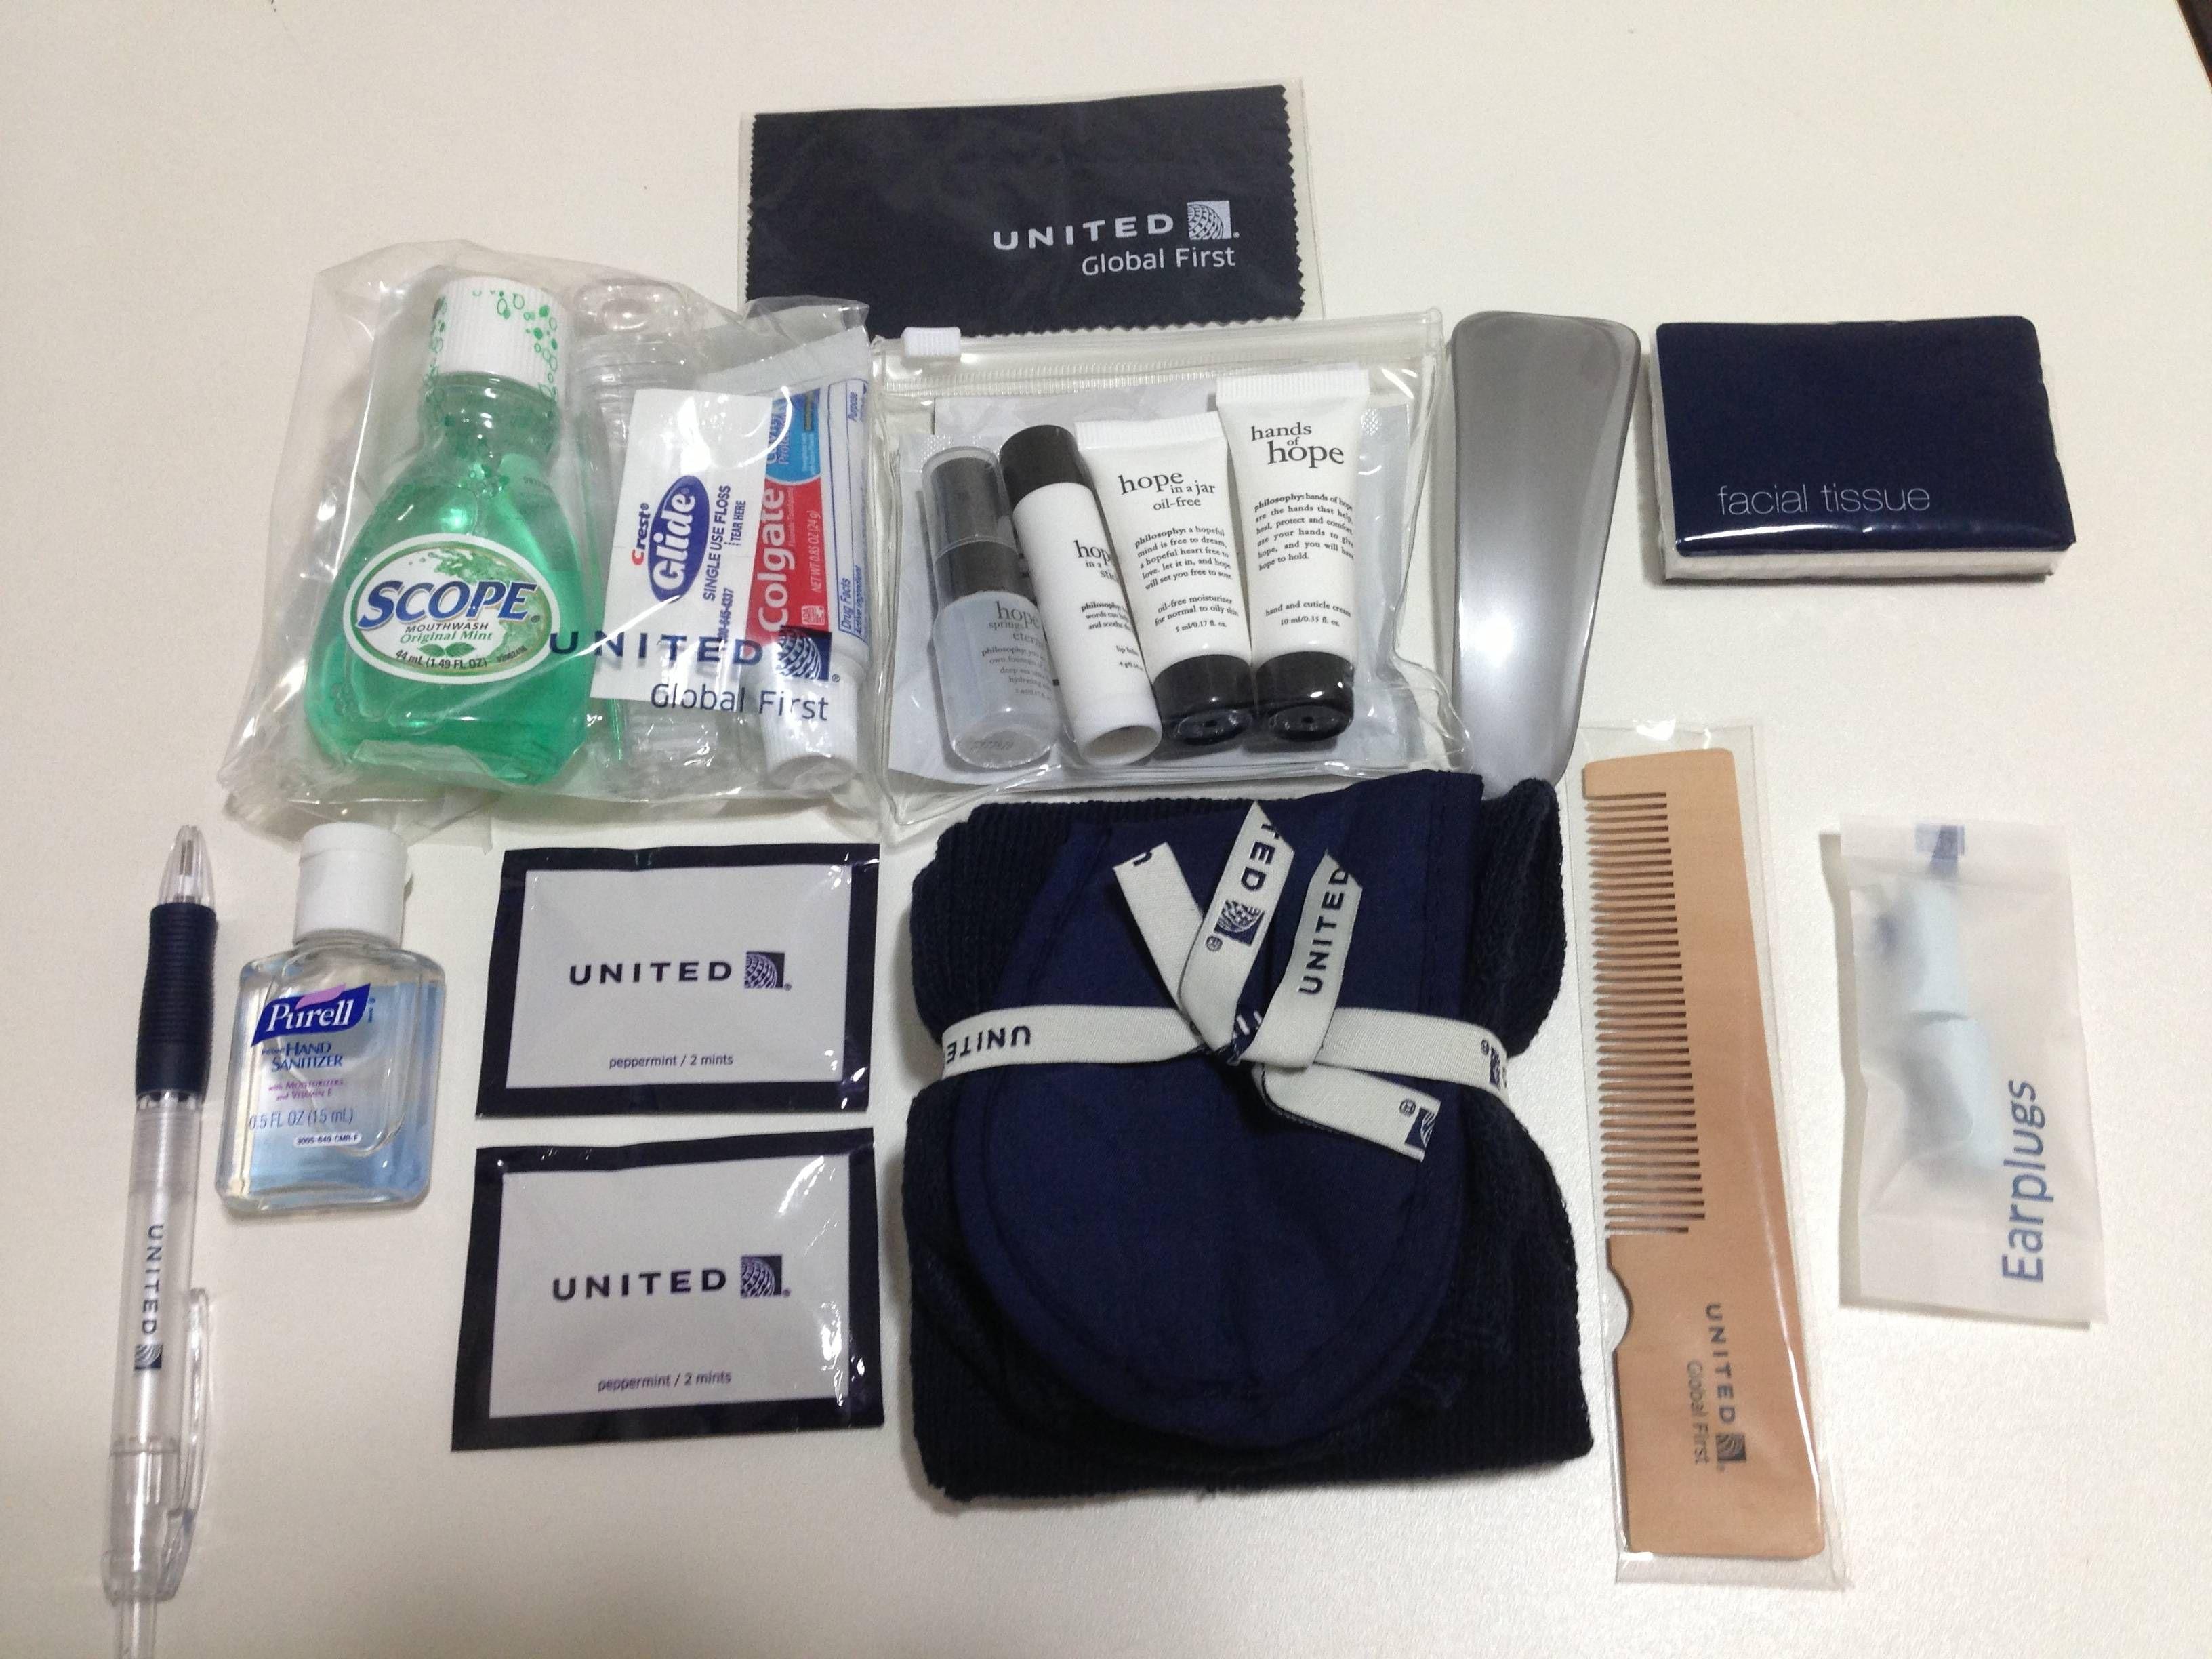 Kit de Amenidades United Primeira Classe - Amenity Kit United Global First